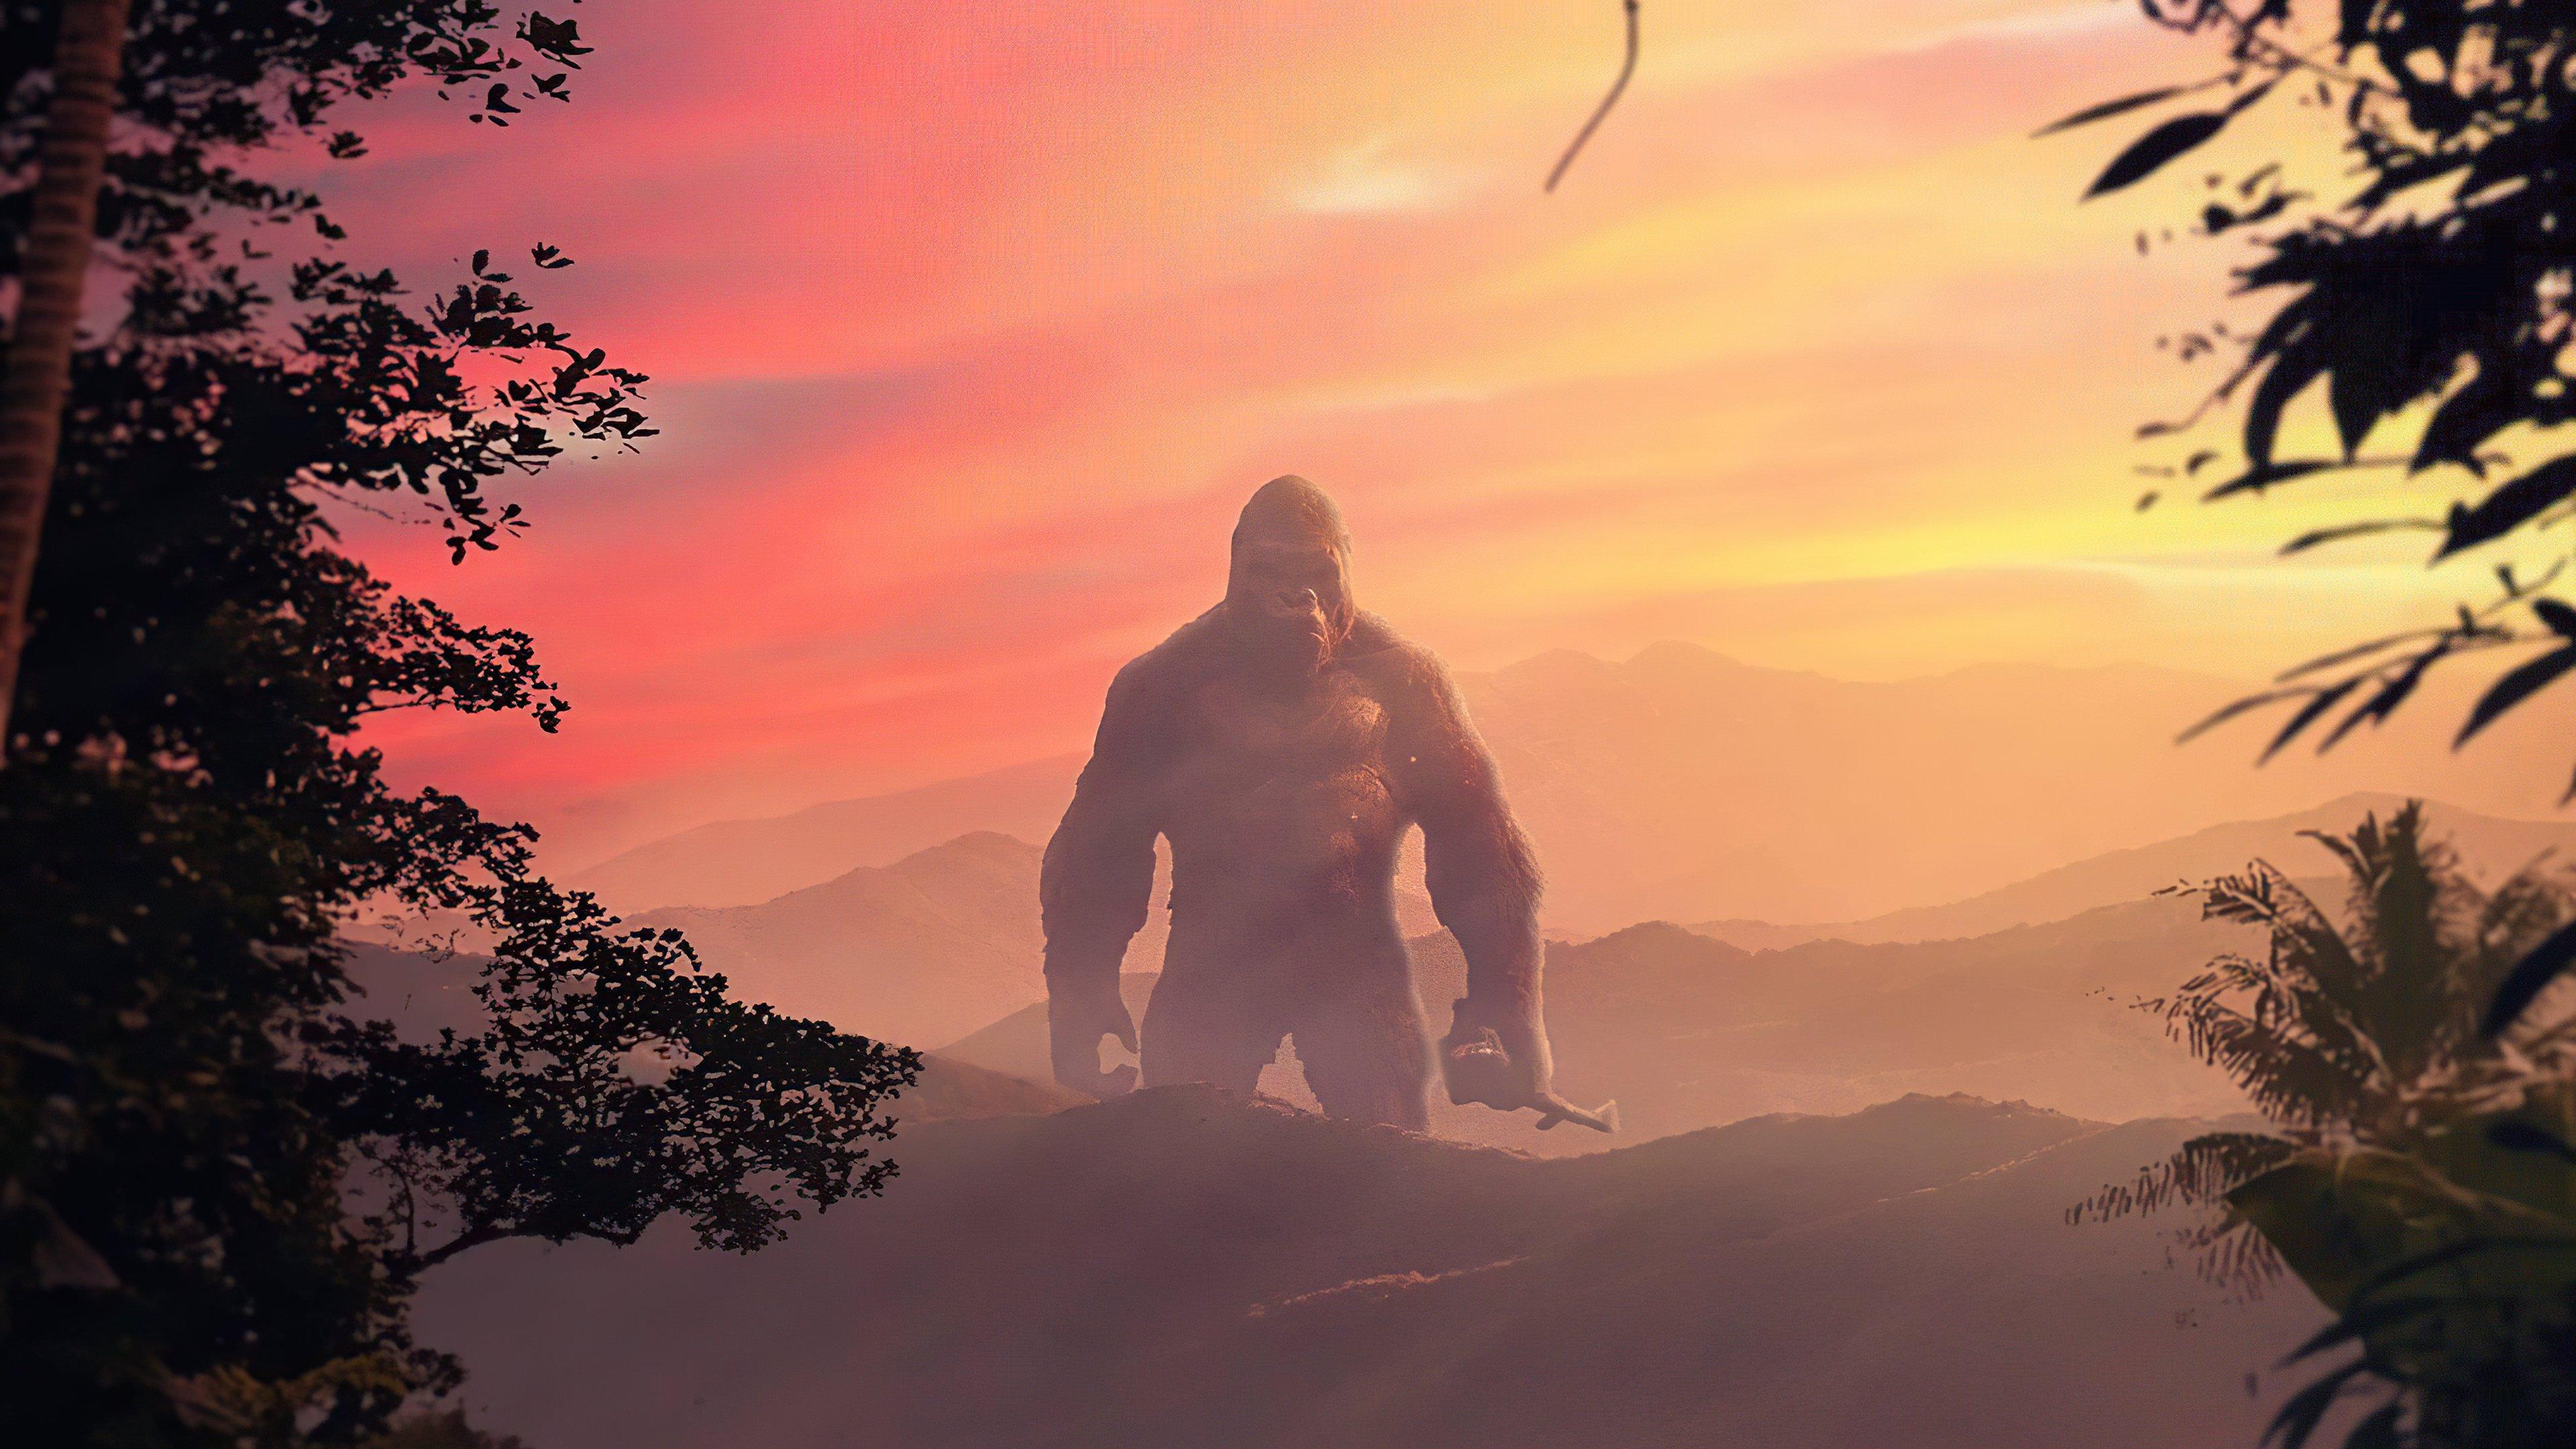 Fondos de pantalla Godzilla vs Kong Poster